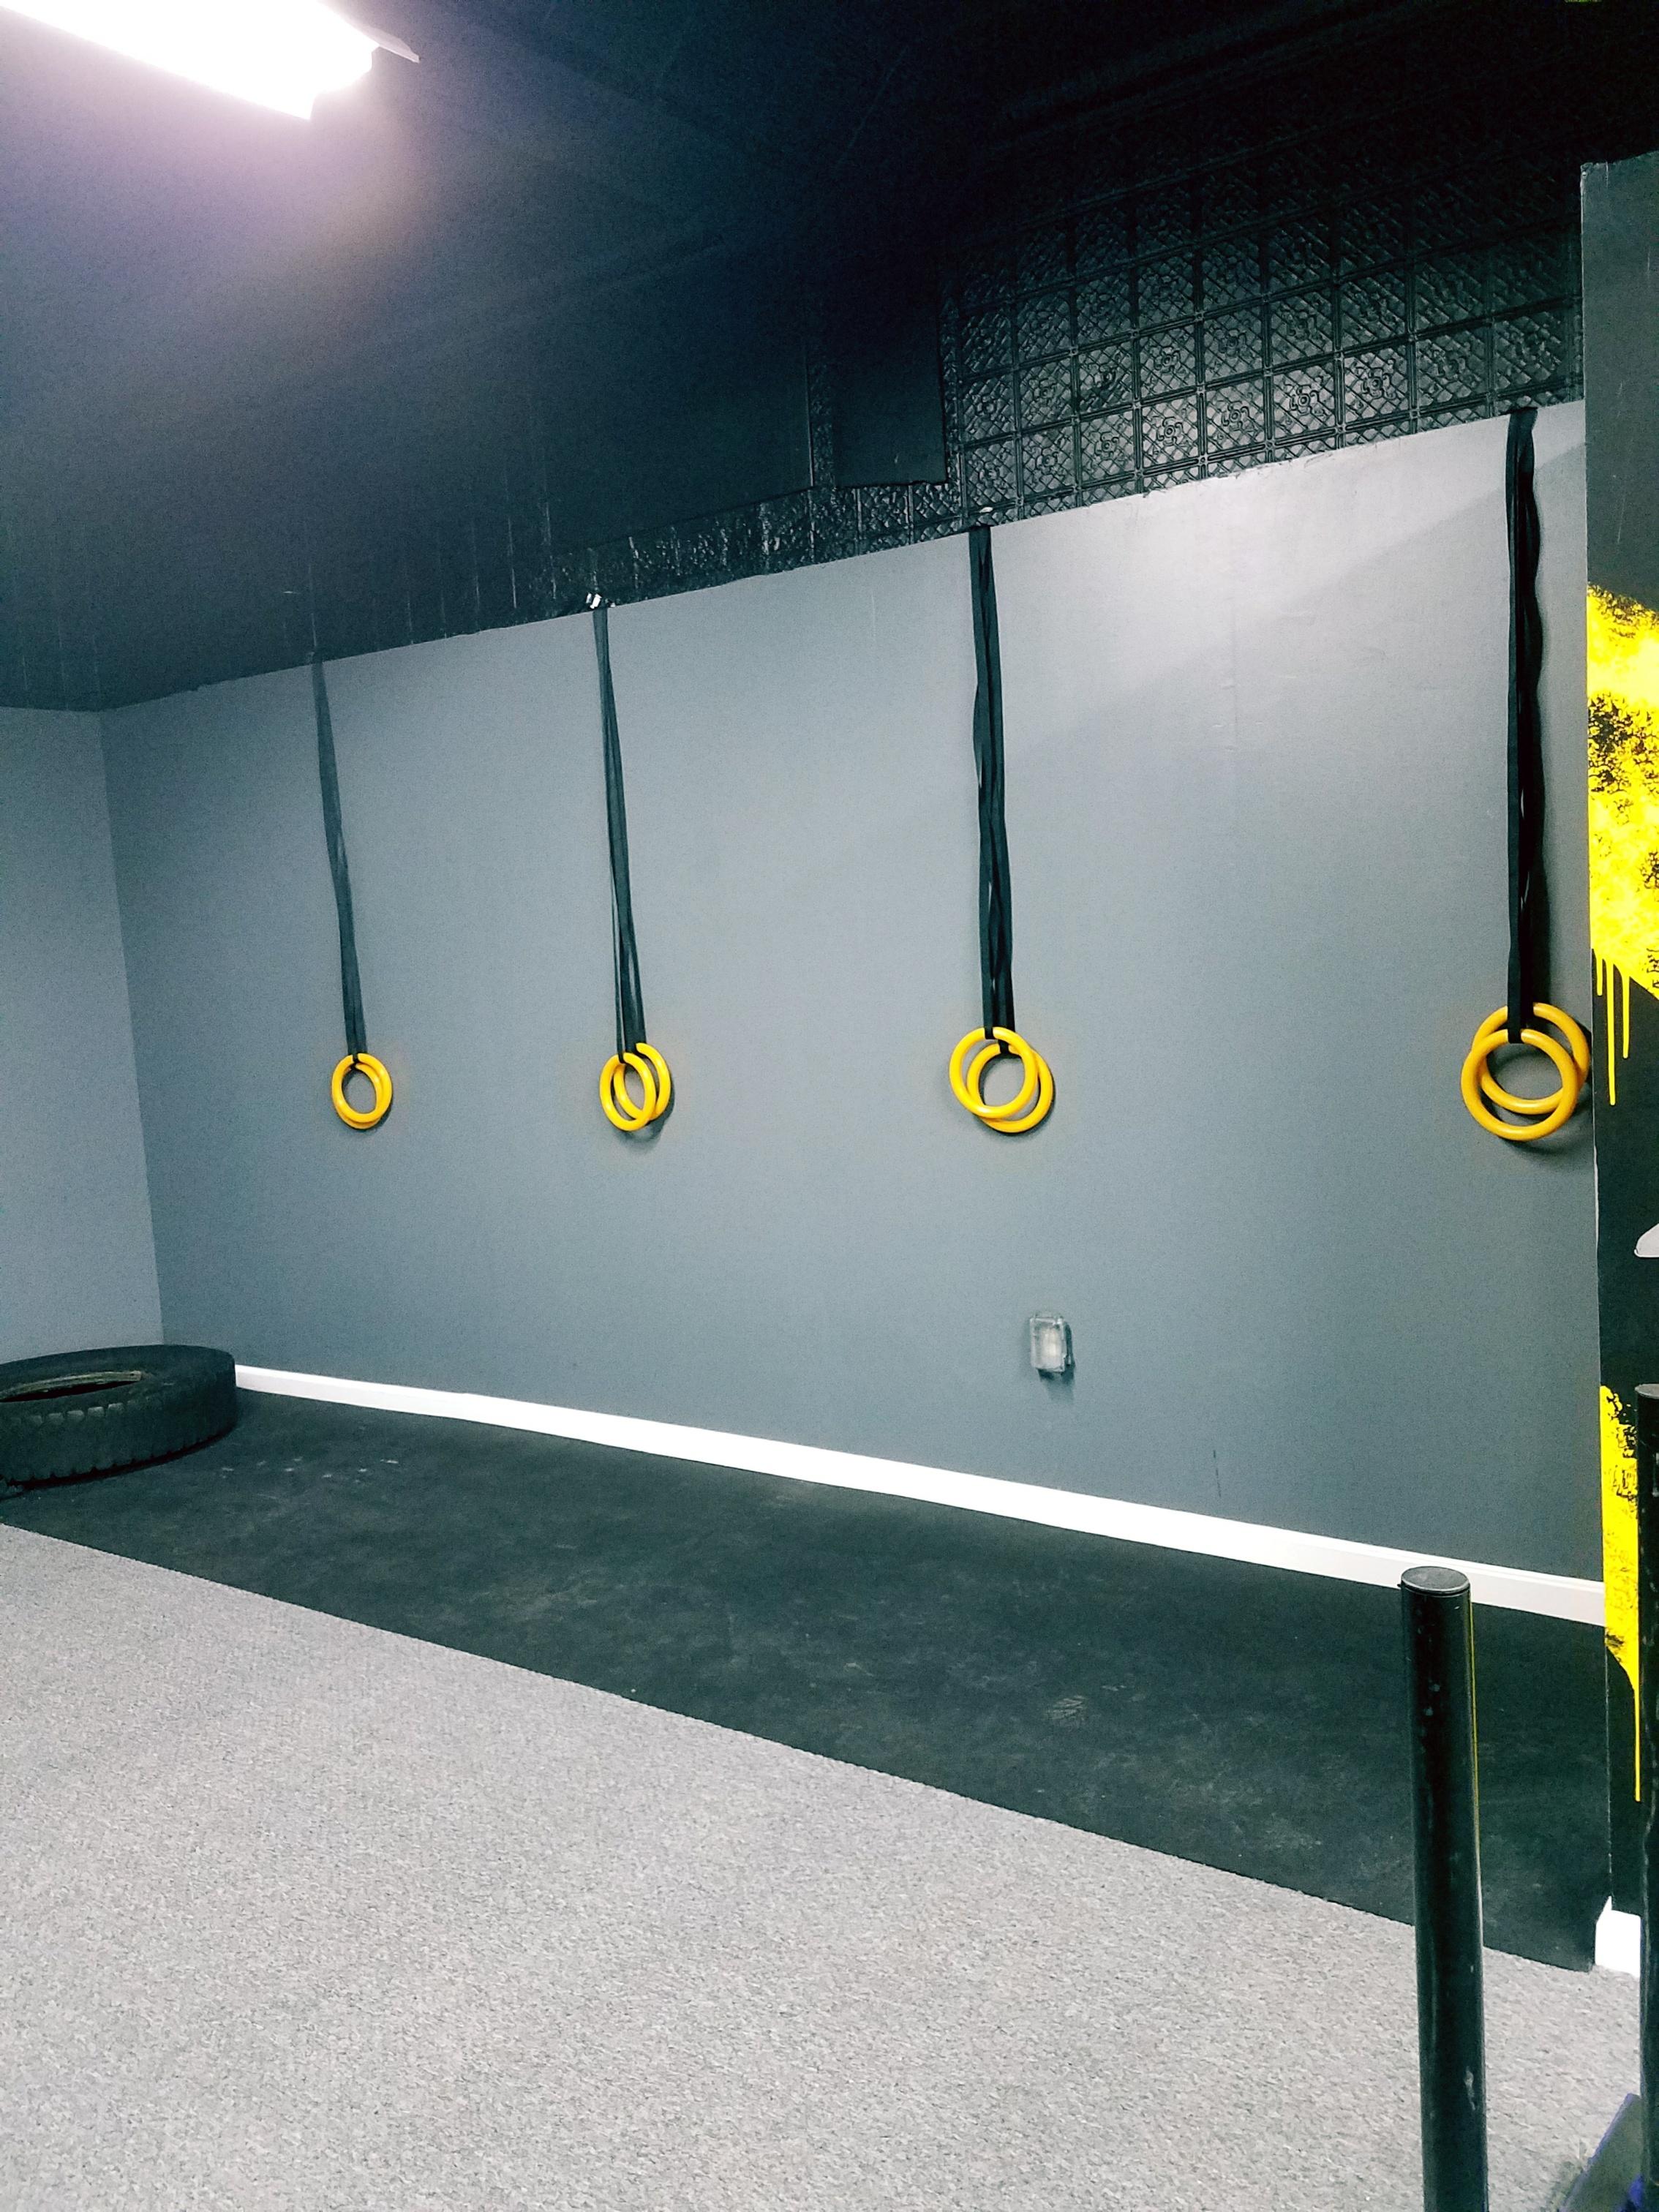 gym_rings